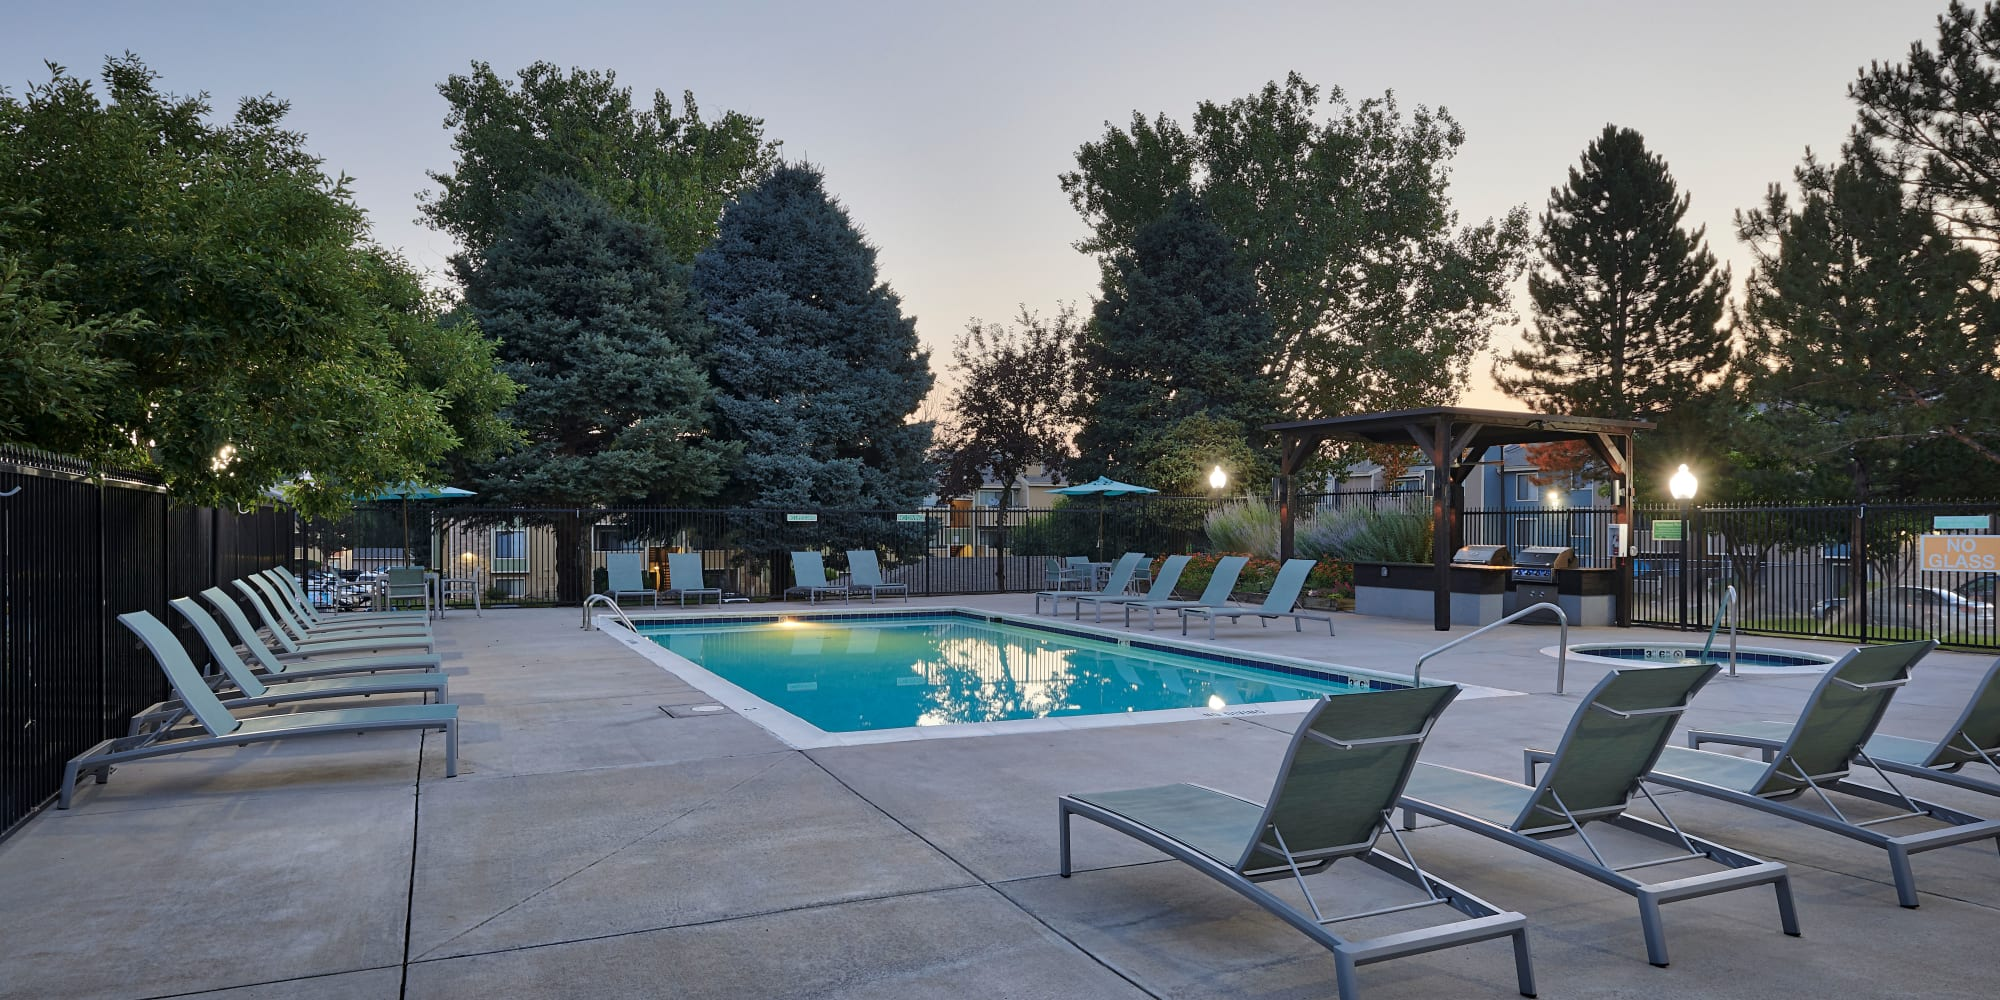 Exterior Pool at sunrise in Denver, CO